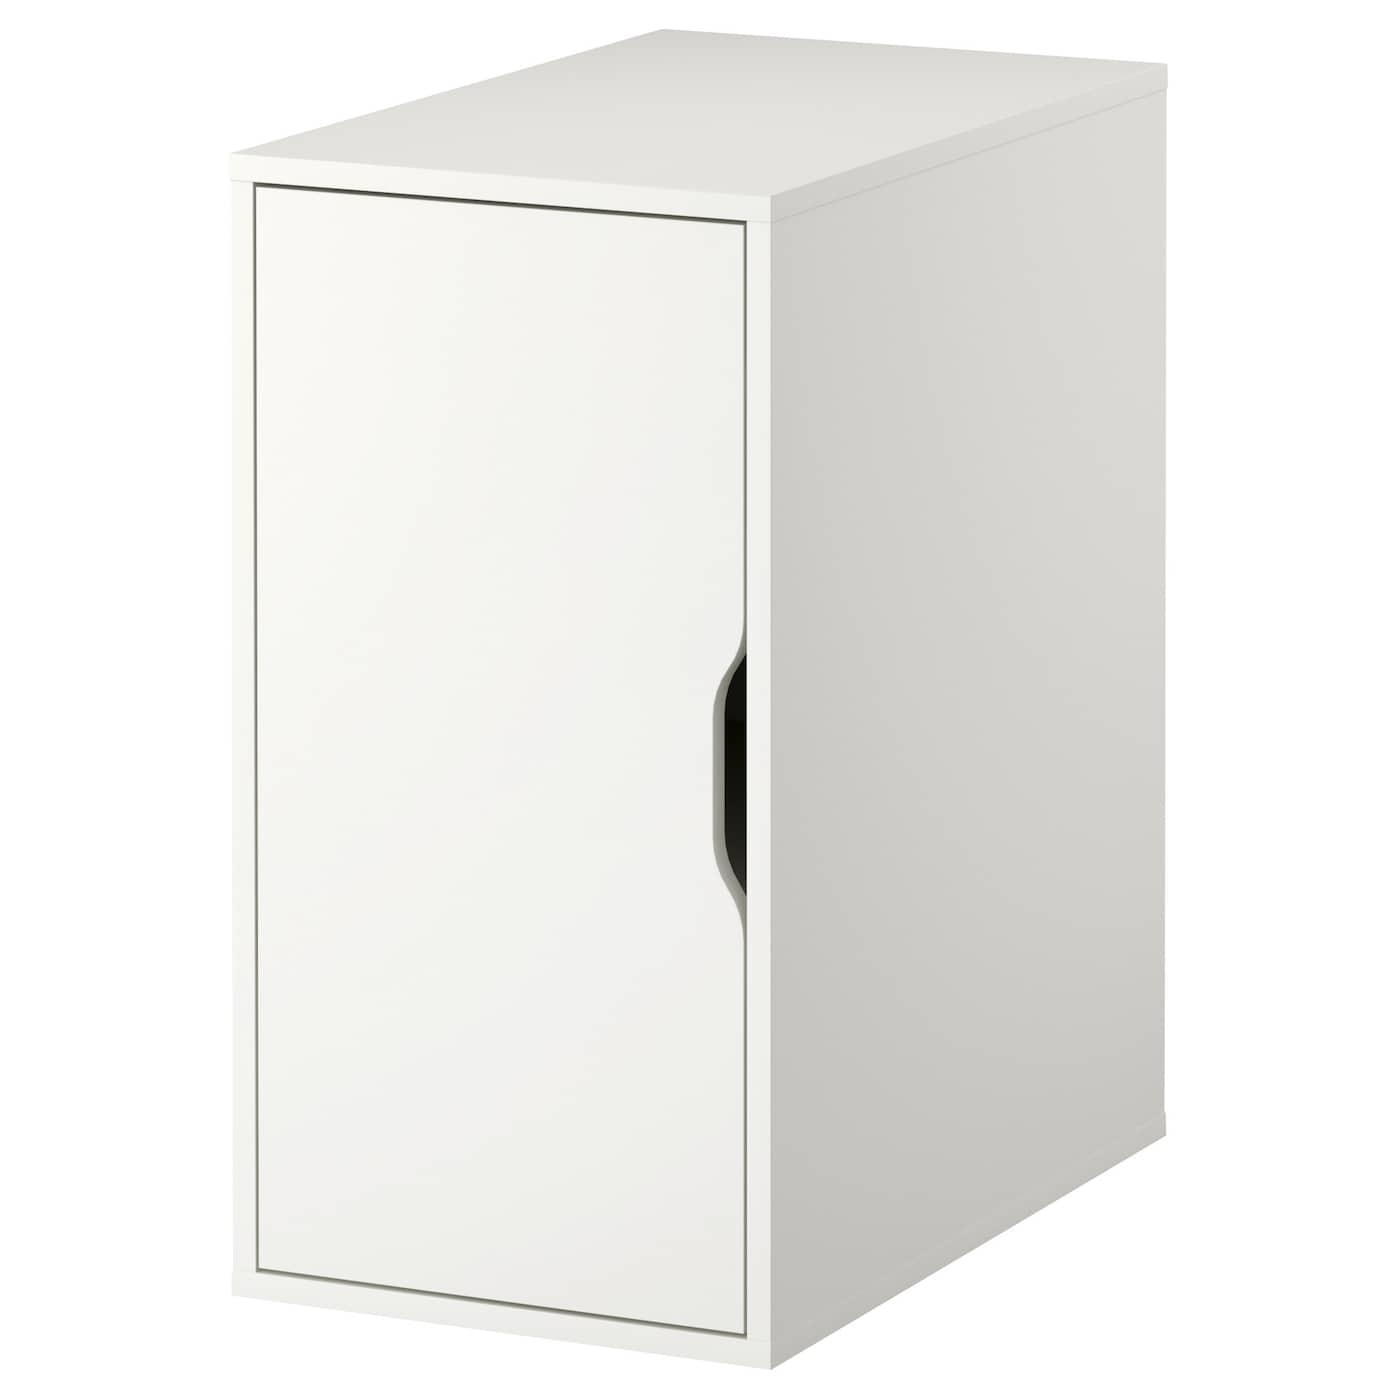 alex rangement blanc 36 x 70 cm ikea. Black Bedroom Furniture Sets. Home Design Ideas